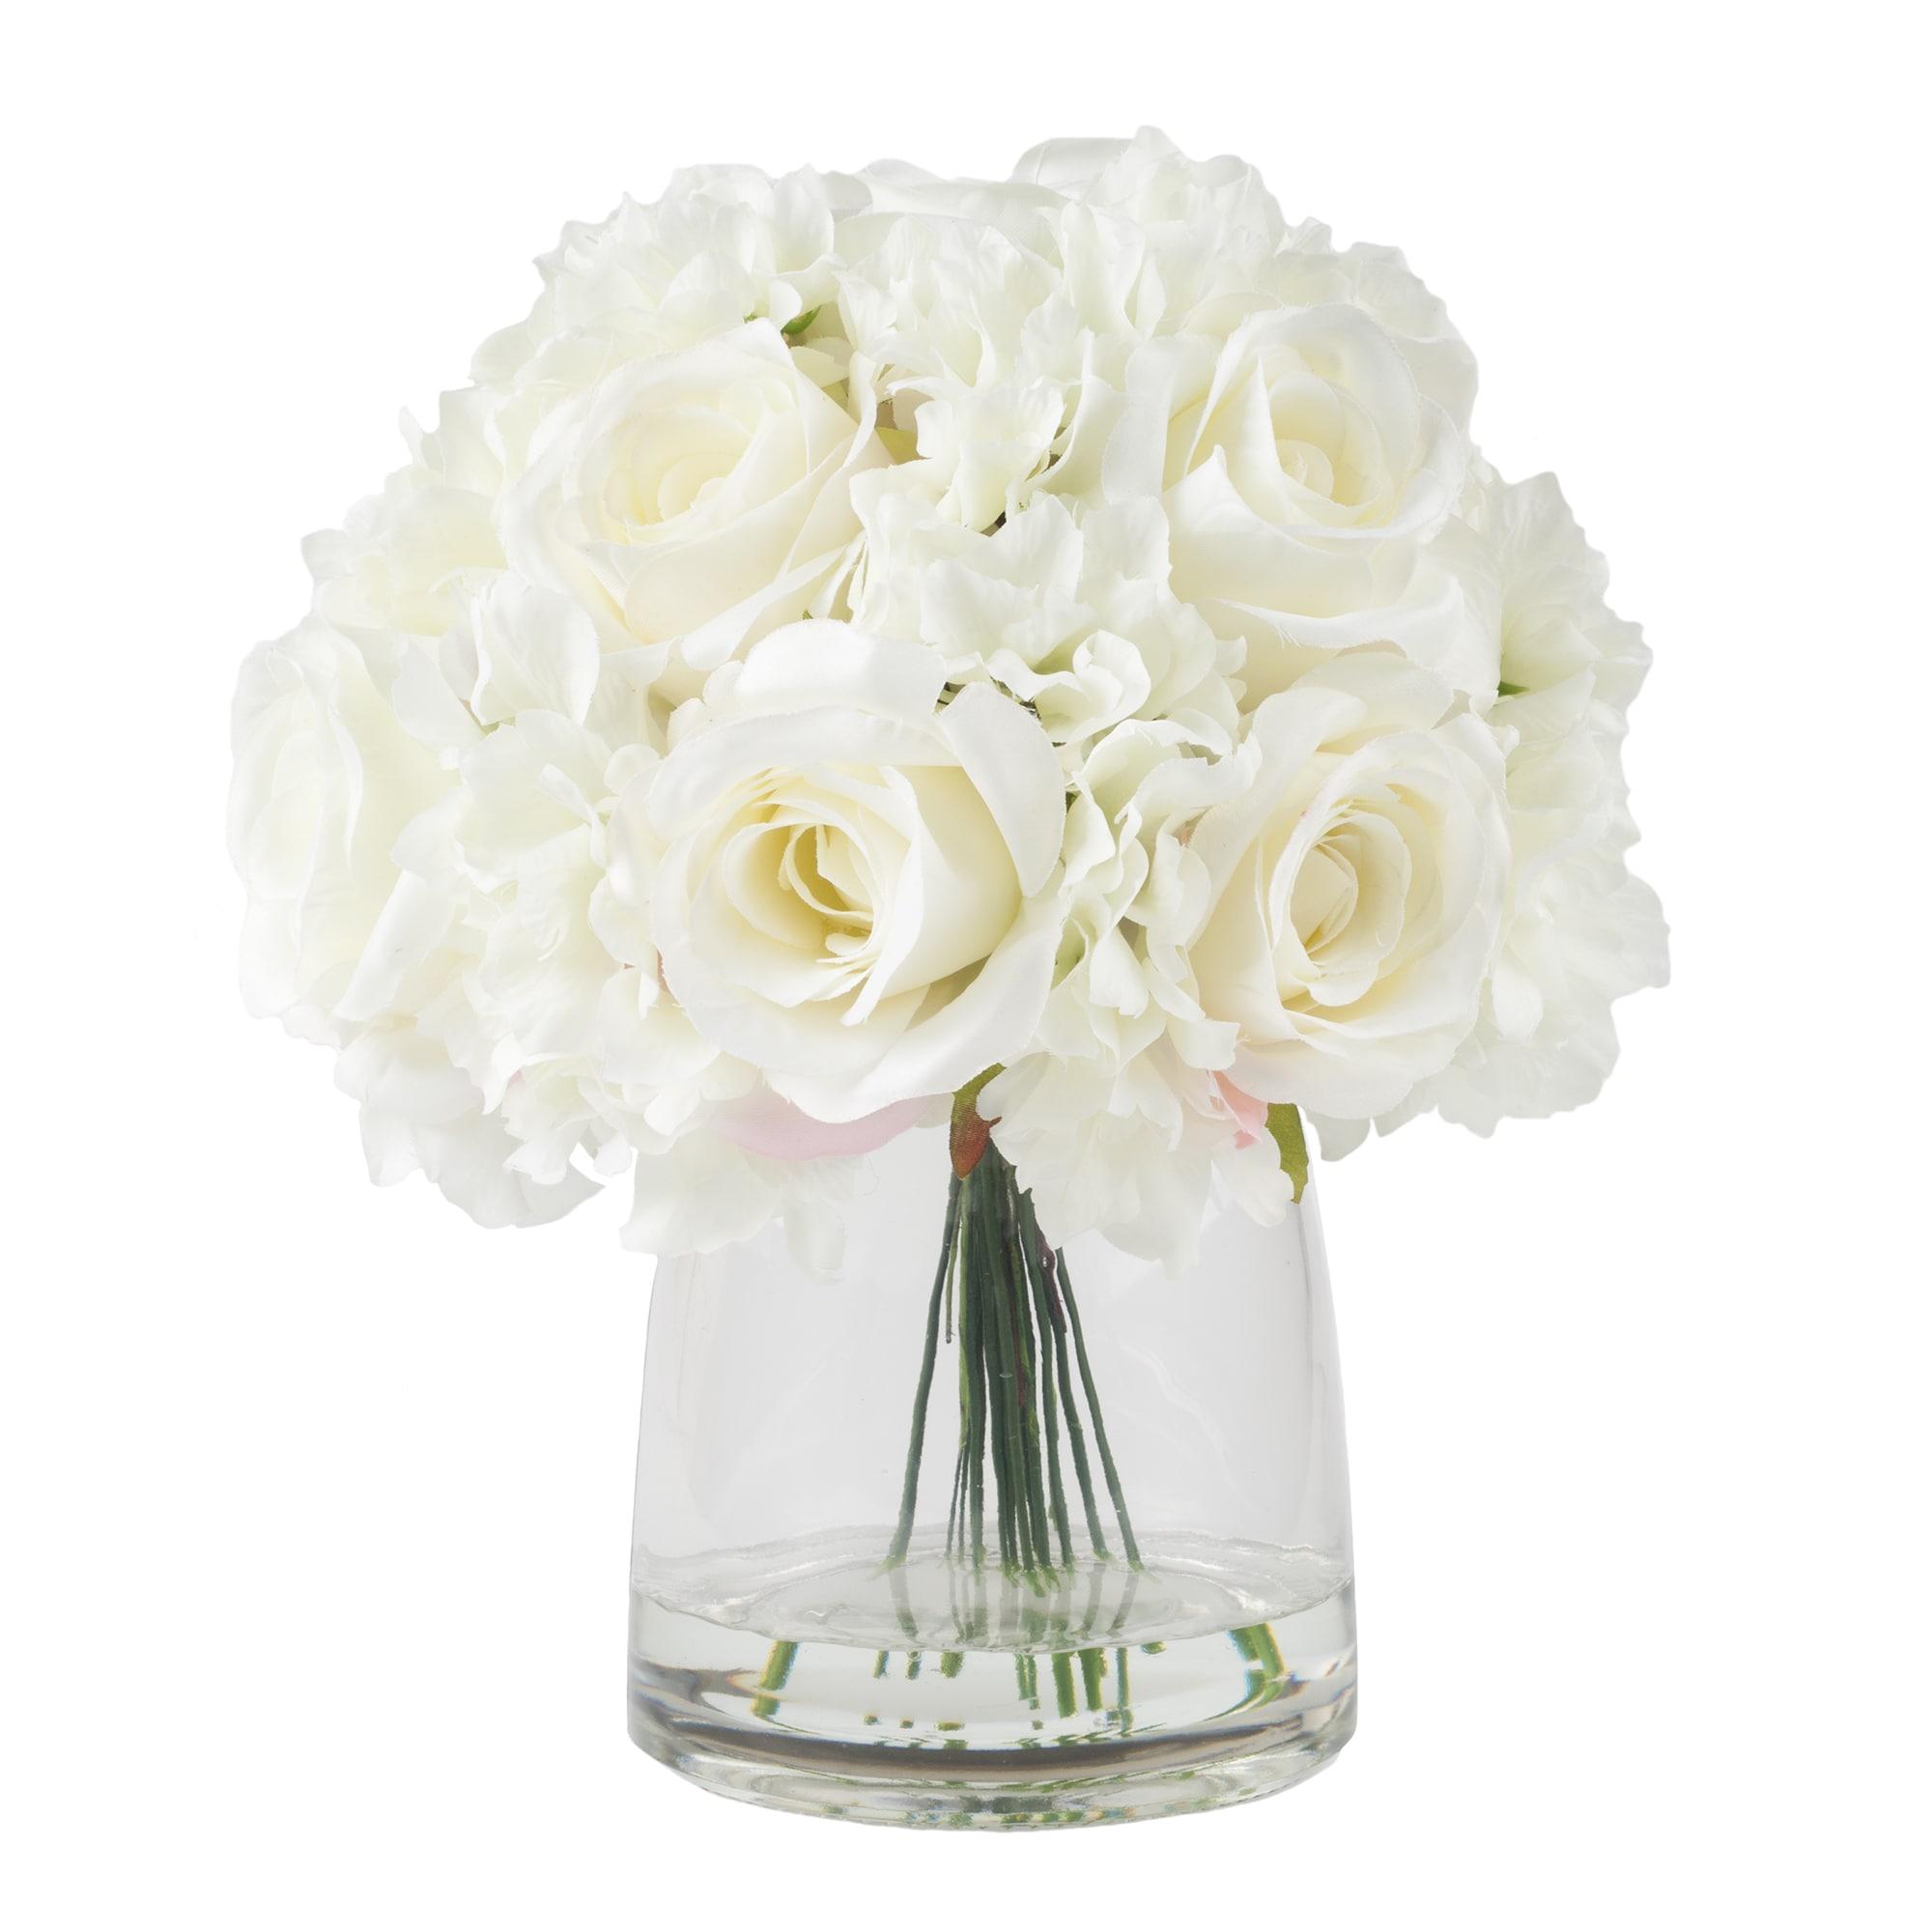 Shop Pure Garden Hydrangea And Rose Floral Arrangement With Vase